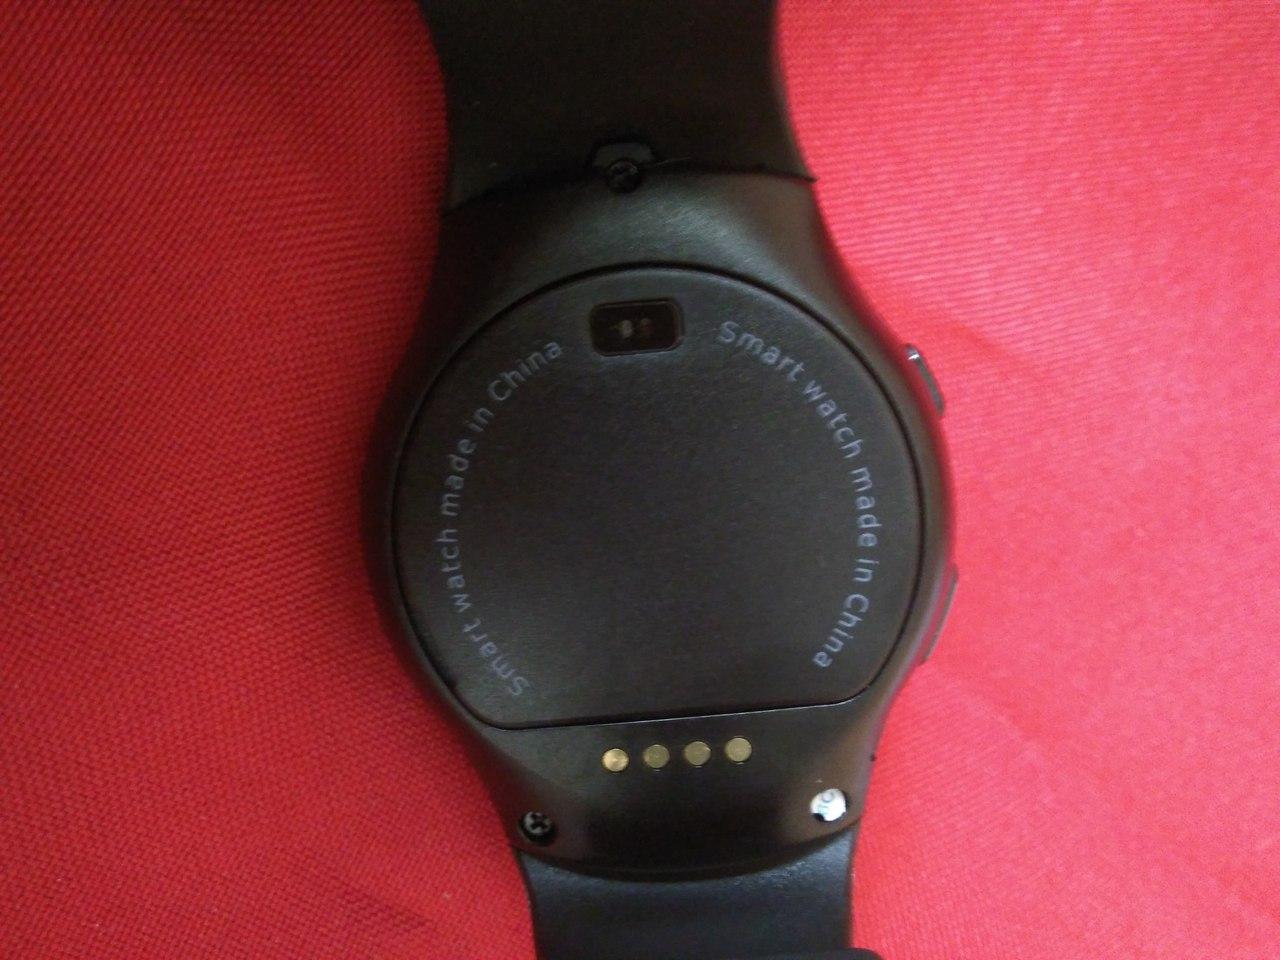 GearBest: NO.1 G3 - спортивного вида поделка на тему Samsung Gear S2